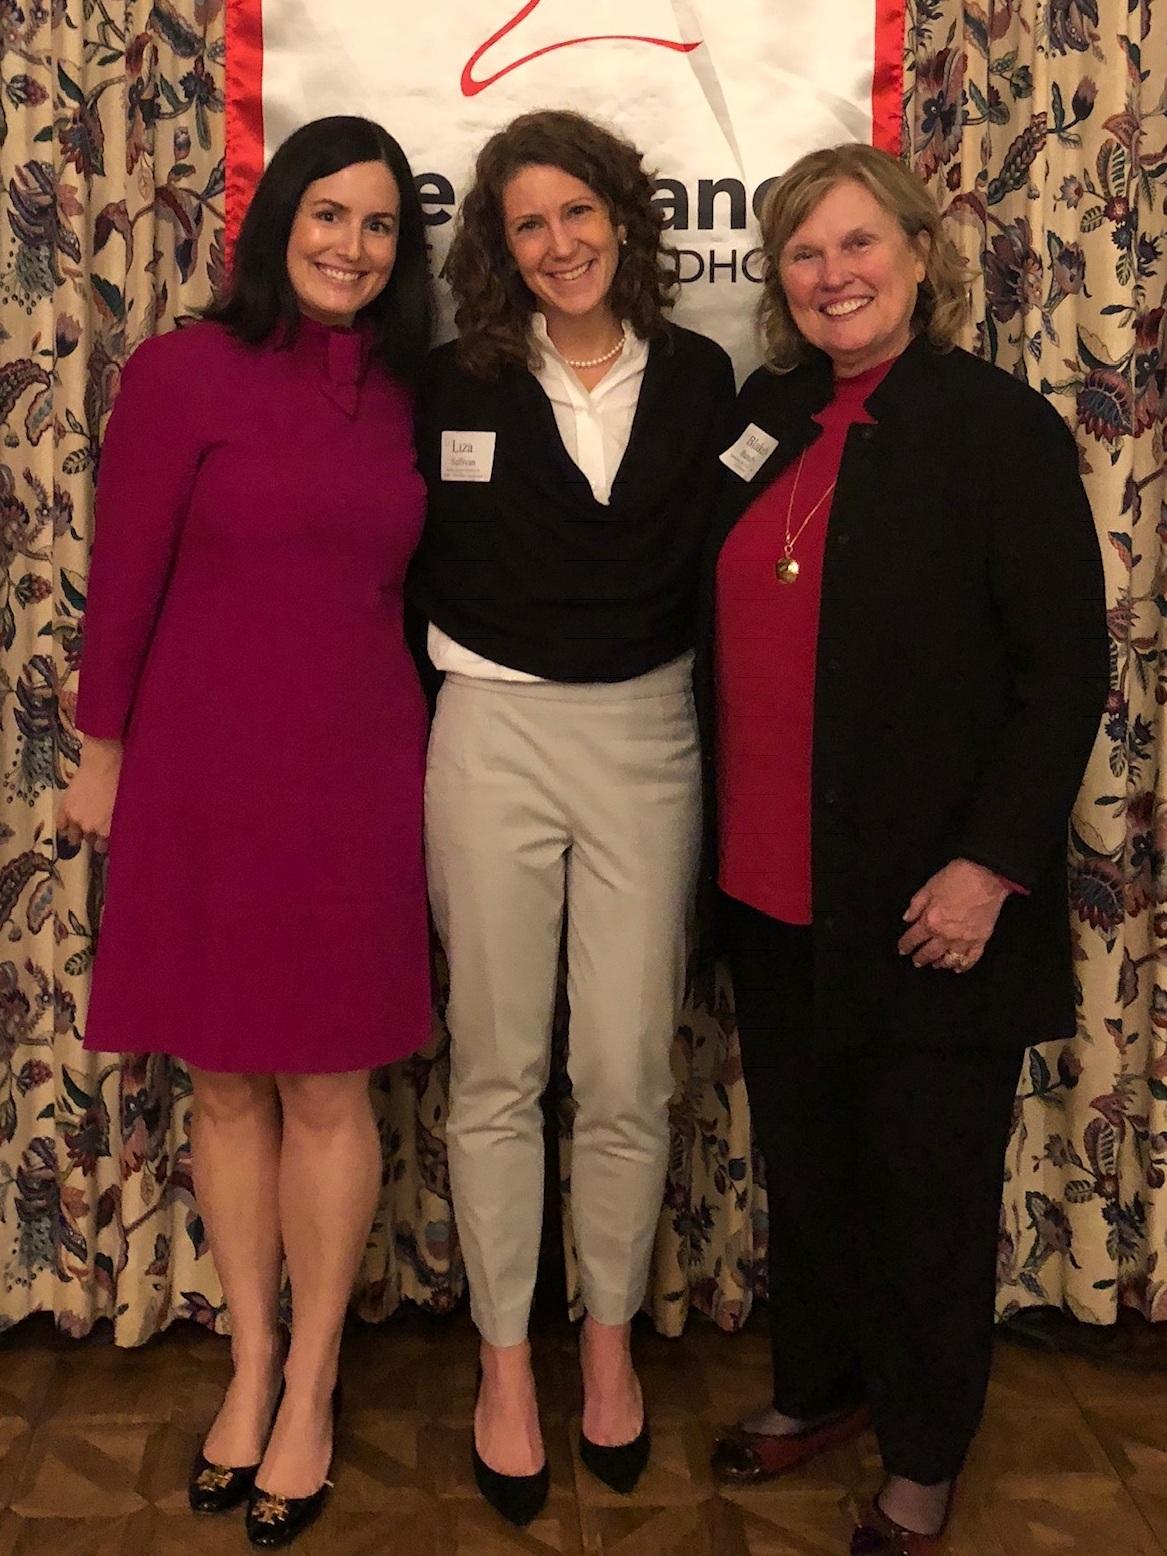 Stefanie Maiuri (Current Executive Director), Liza Sullivan (former Executive Director), and Blakely Bundy (Executive Director Emeritus).